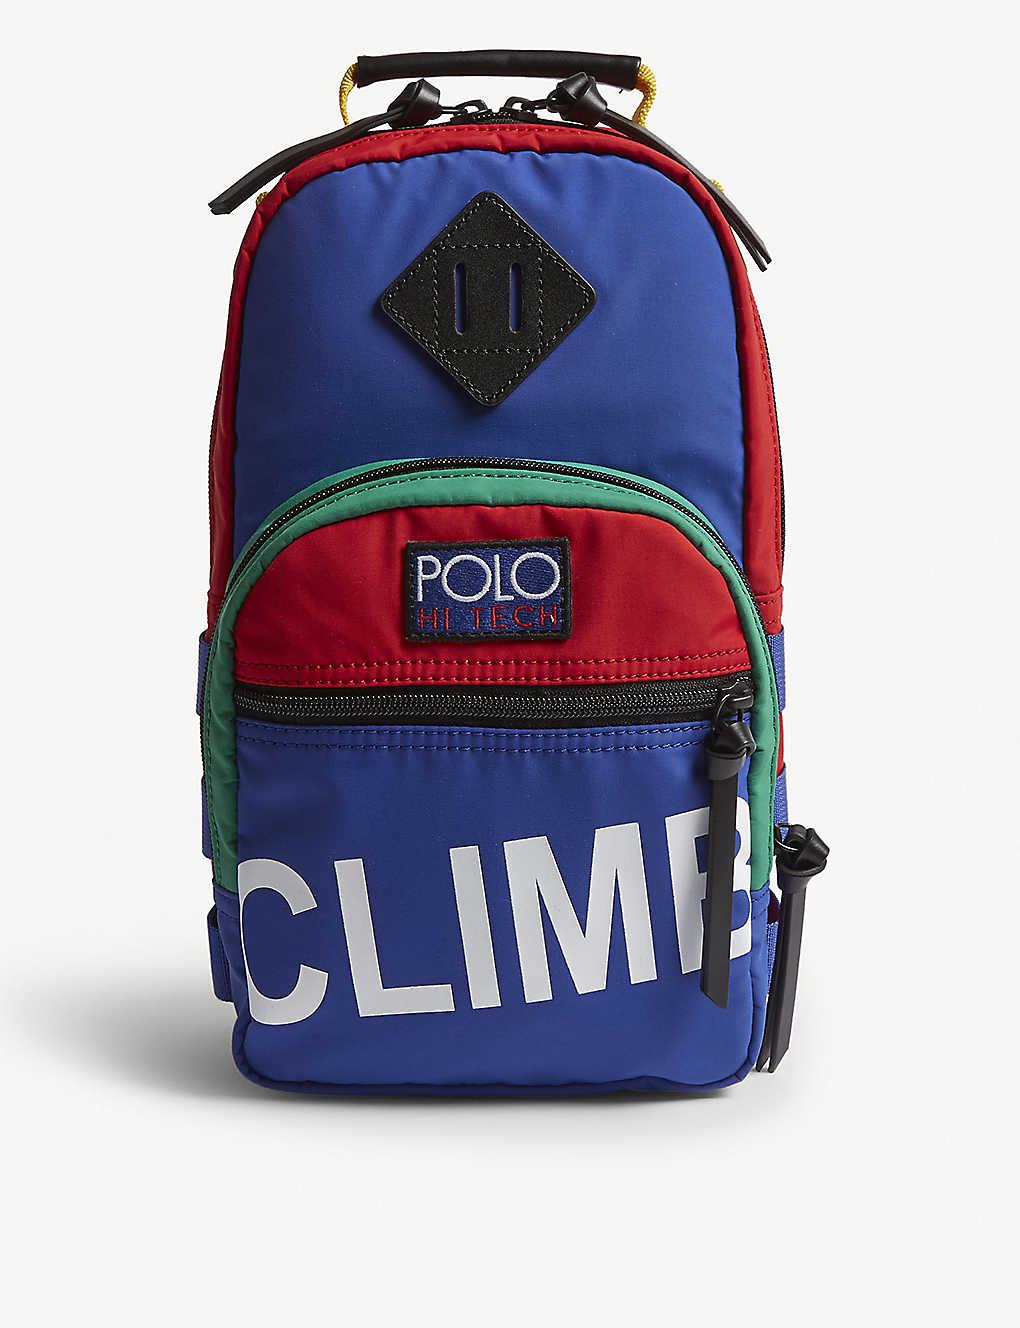 9c2cca0ca893 POLO RALPH LAUREN - Hitech sling crossbody bag